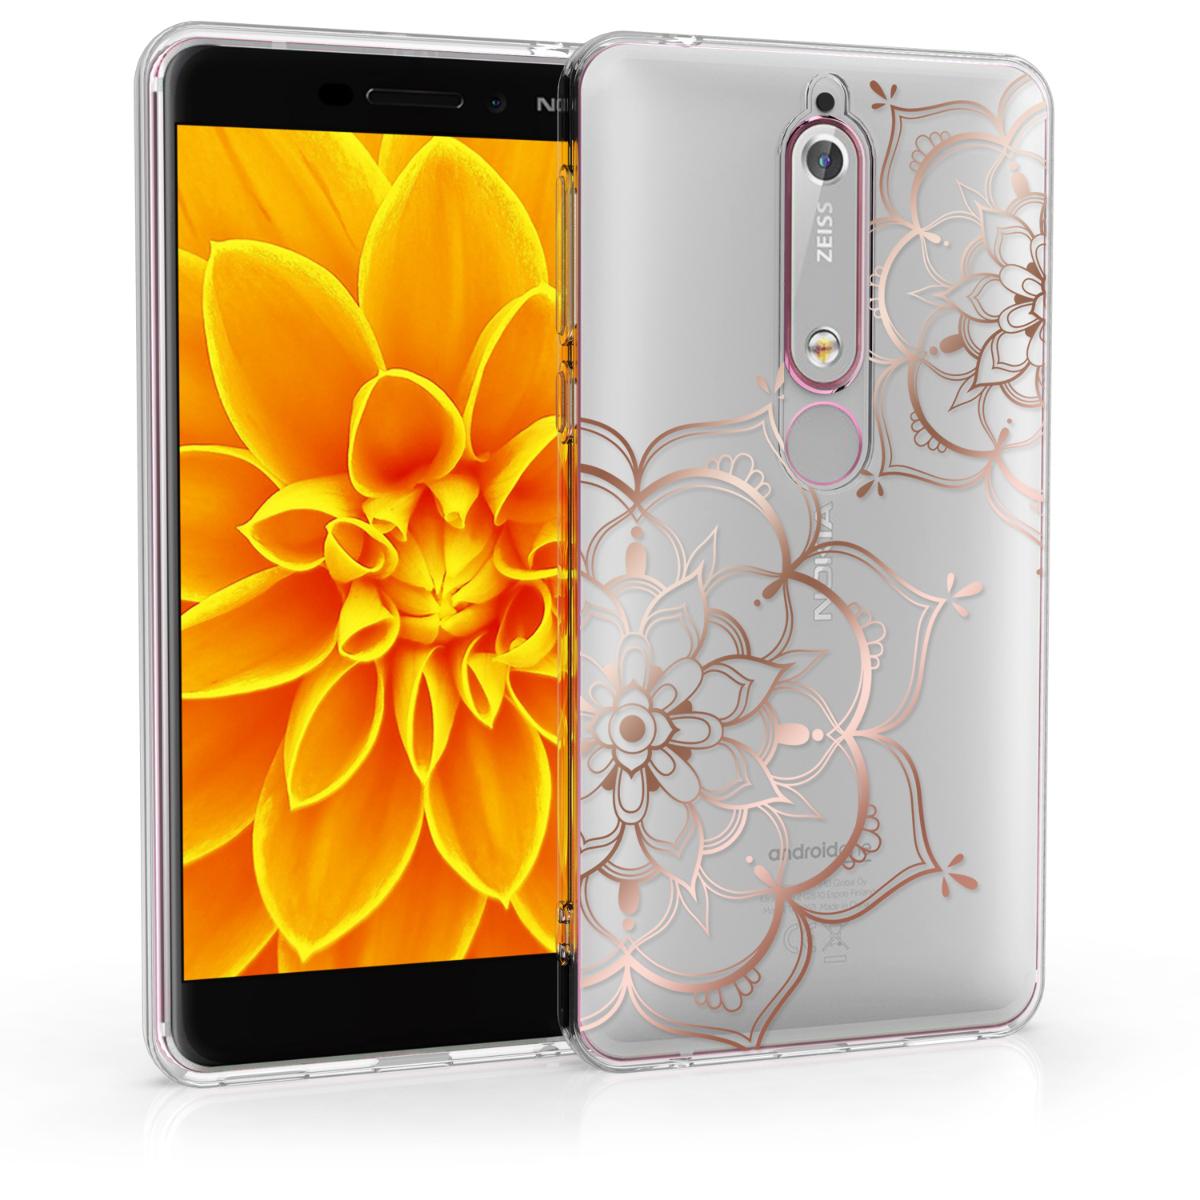 KW Θήκη Σιλικόνης Nokia 6.1 - Soft TPU Silicone - Rose Gold / Transparent (49258.01)